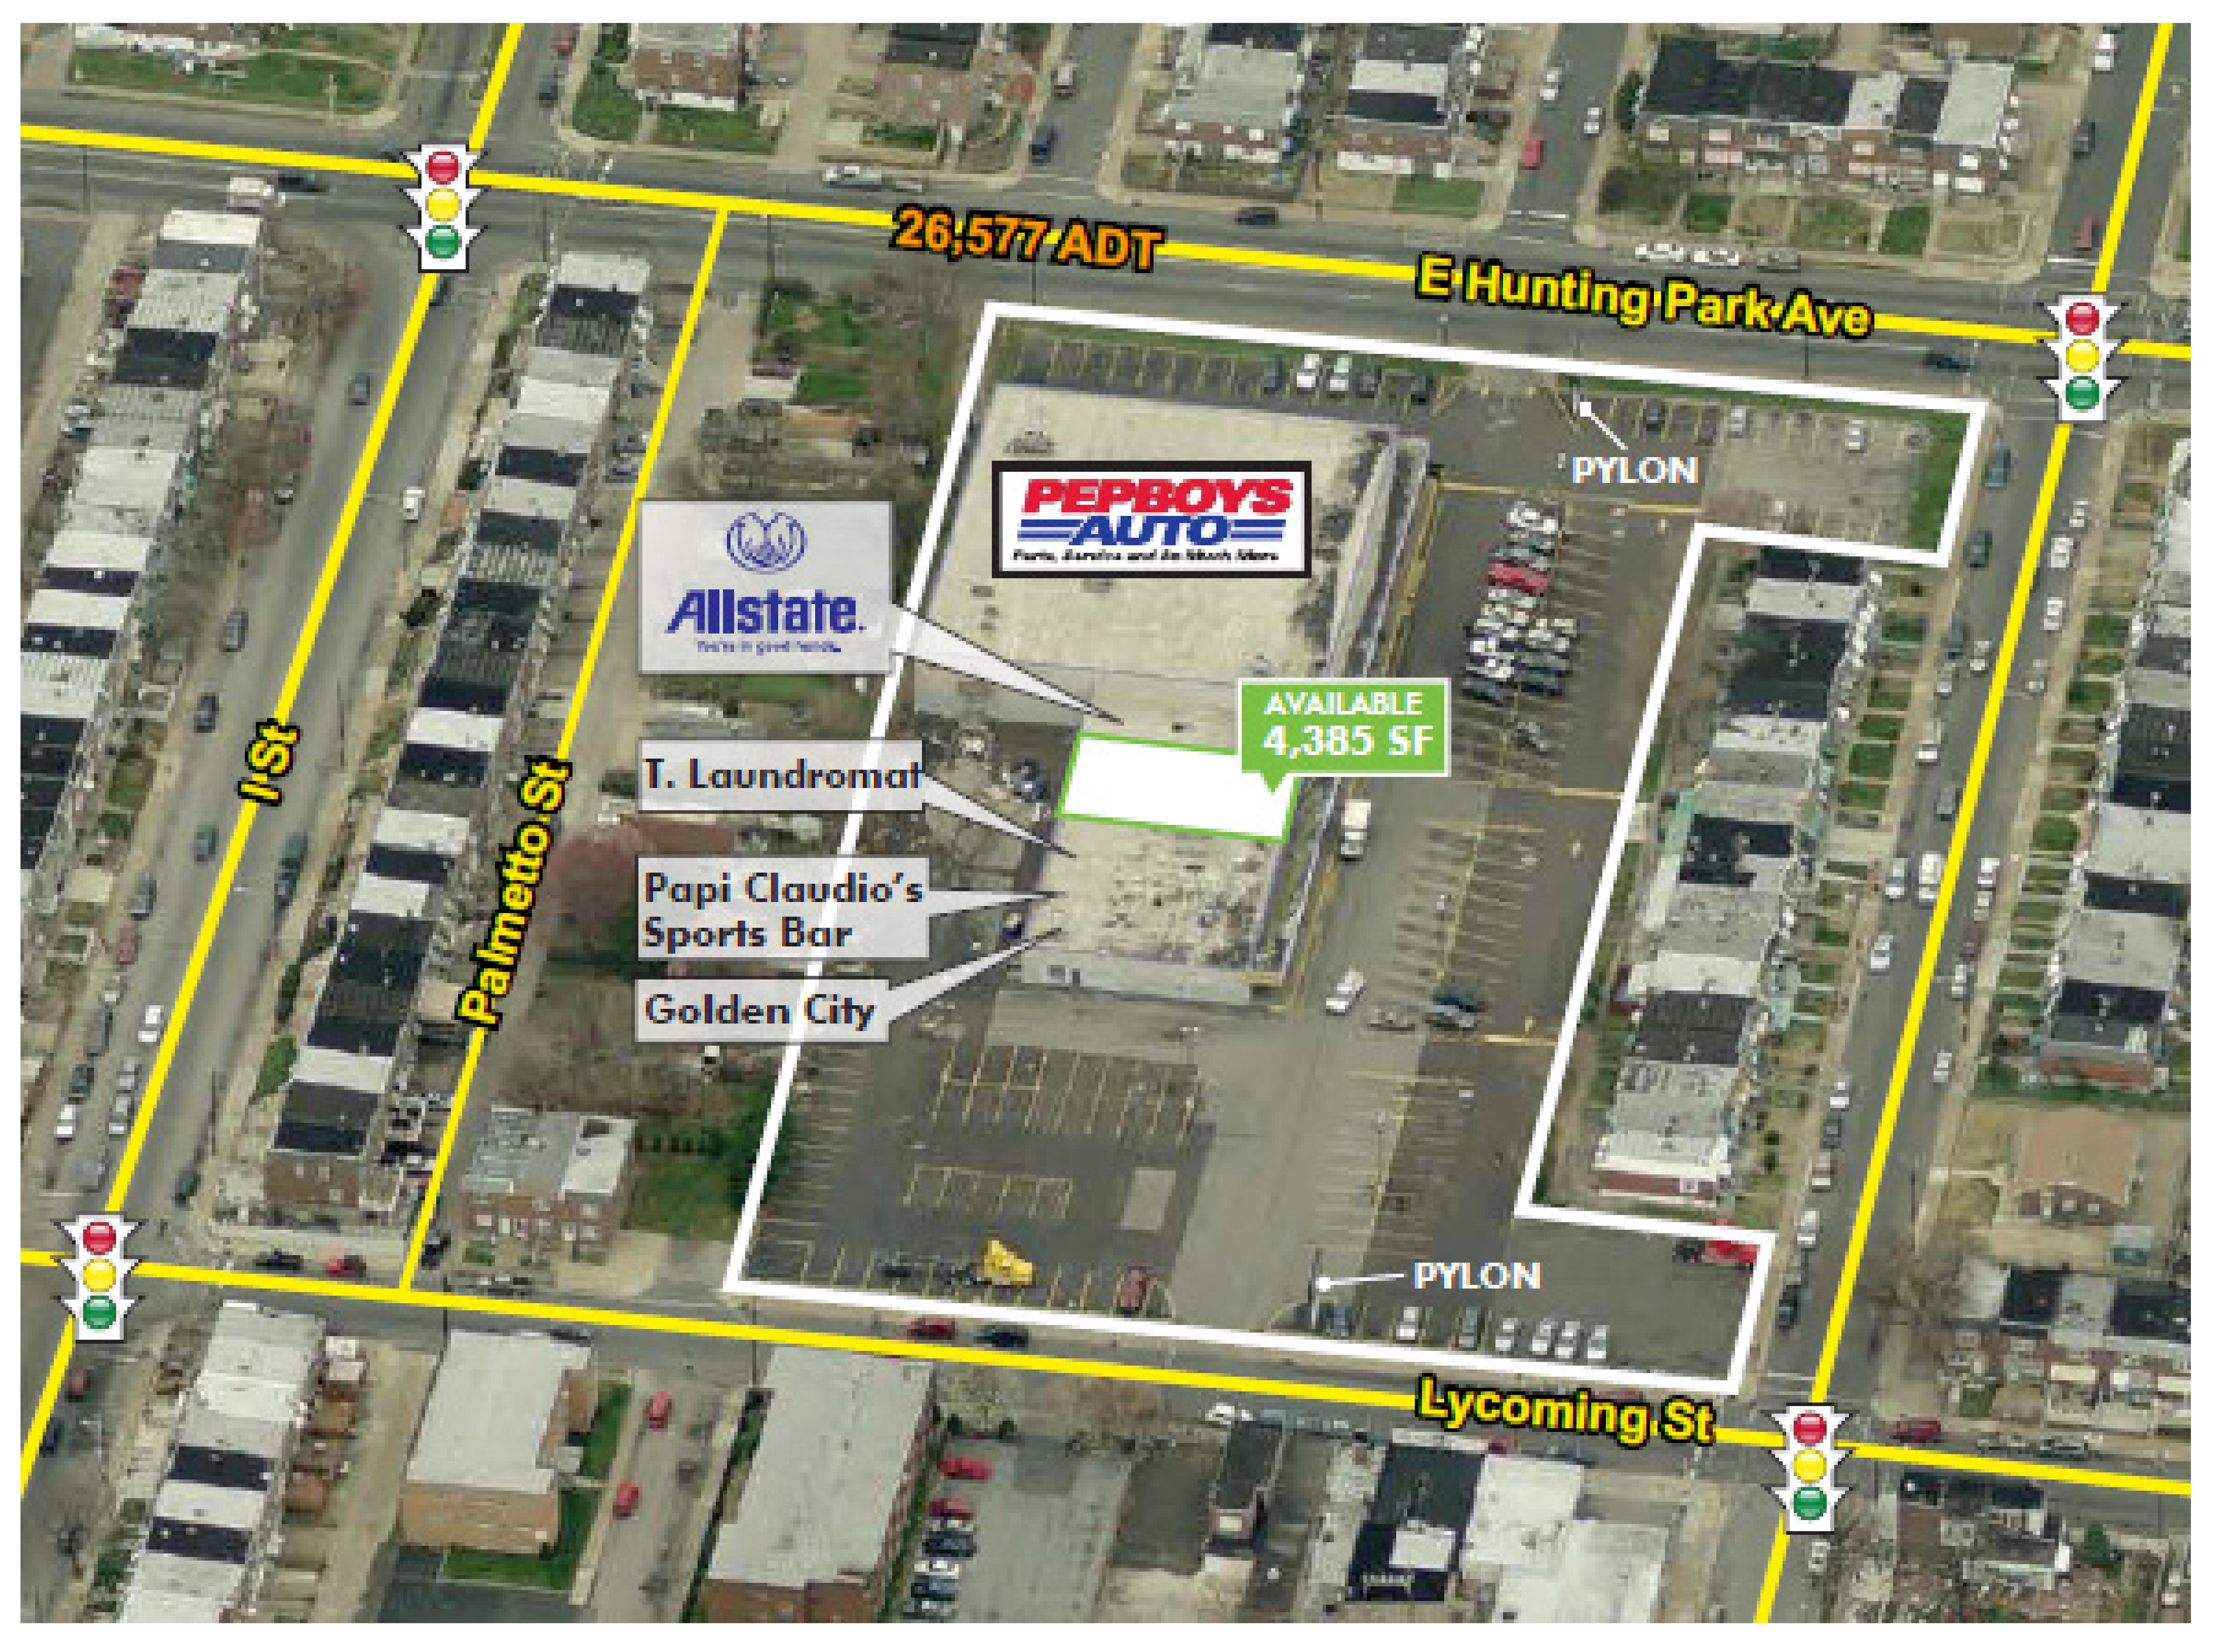 1050 East Hunting Park Avenue: site plan